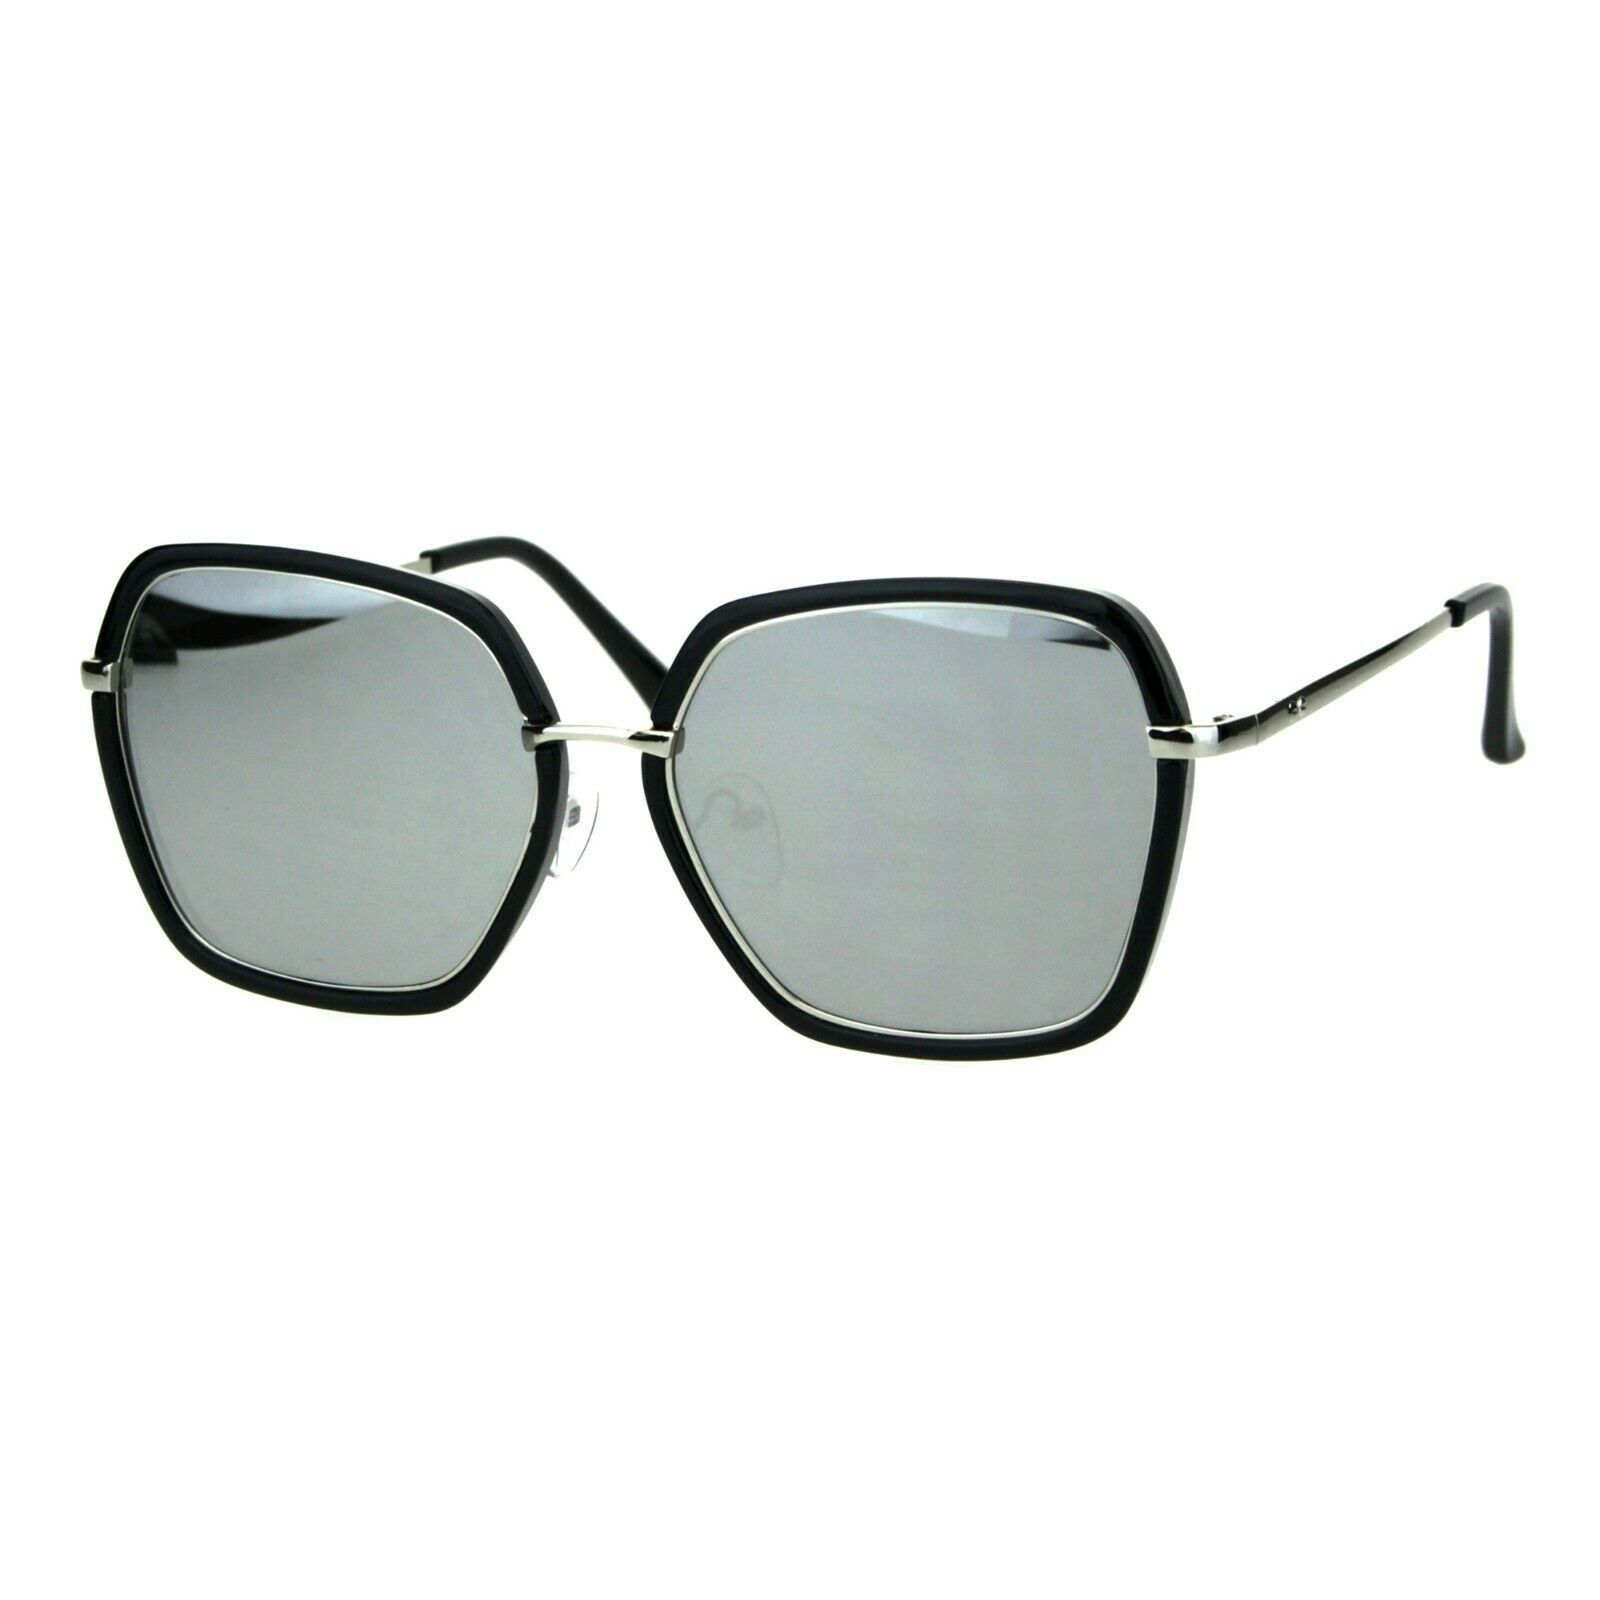 Double Frame Square Sunglasses Womens Designer Chic Shades UV 400